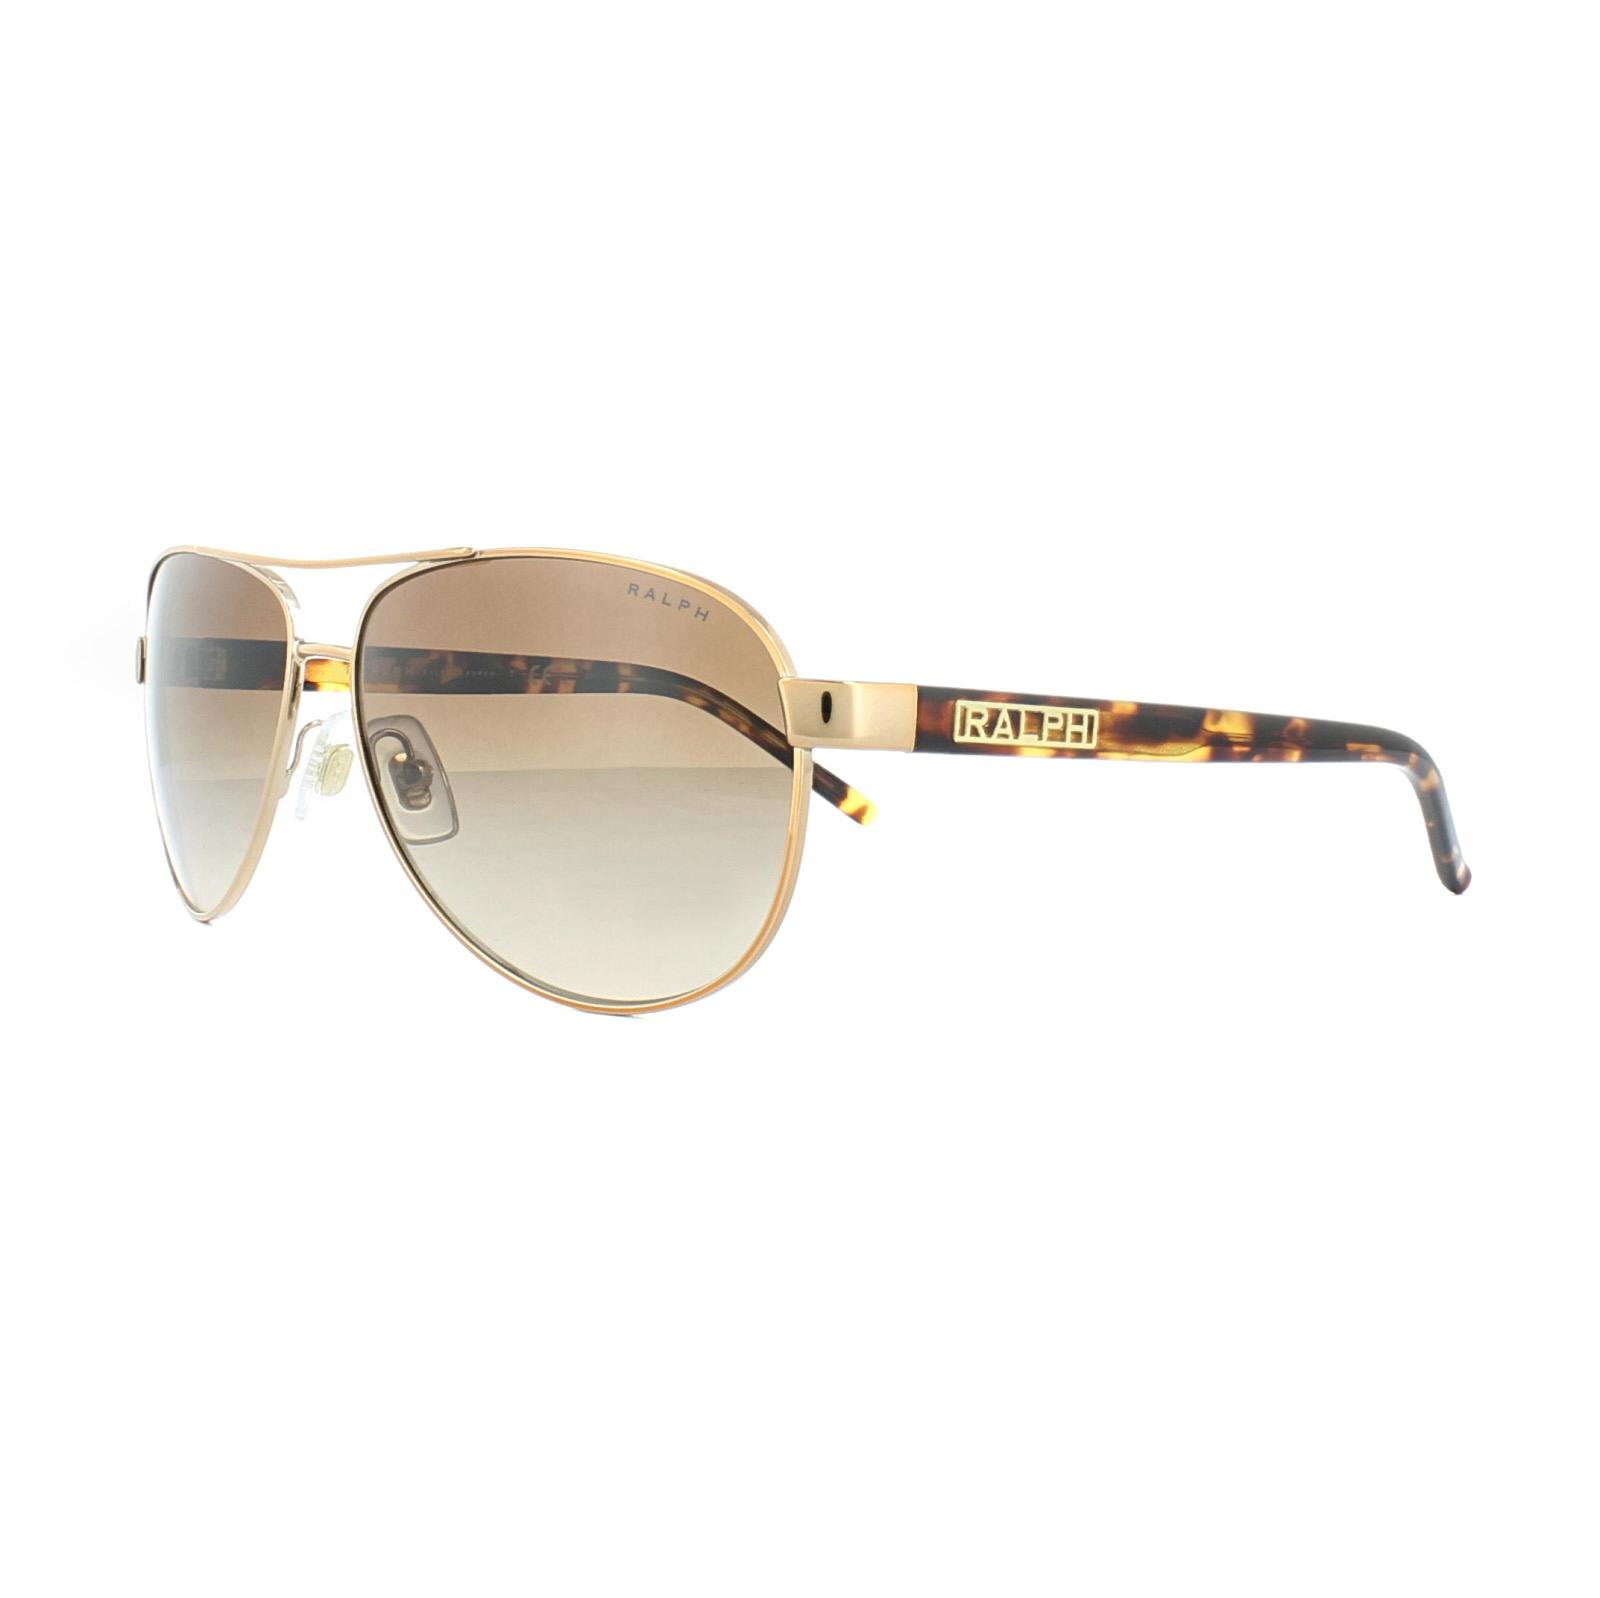 7f8675e169 Sentinel Ralph by Ralph Lauren Sunglasses 4004 104 13 Copper Havana Brown  Gradient